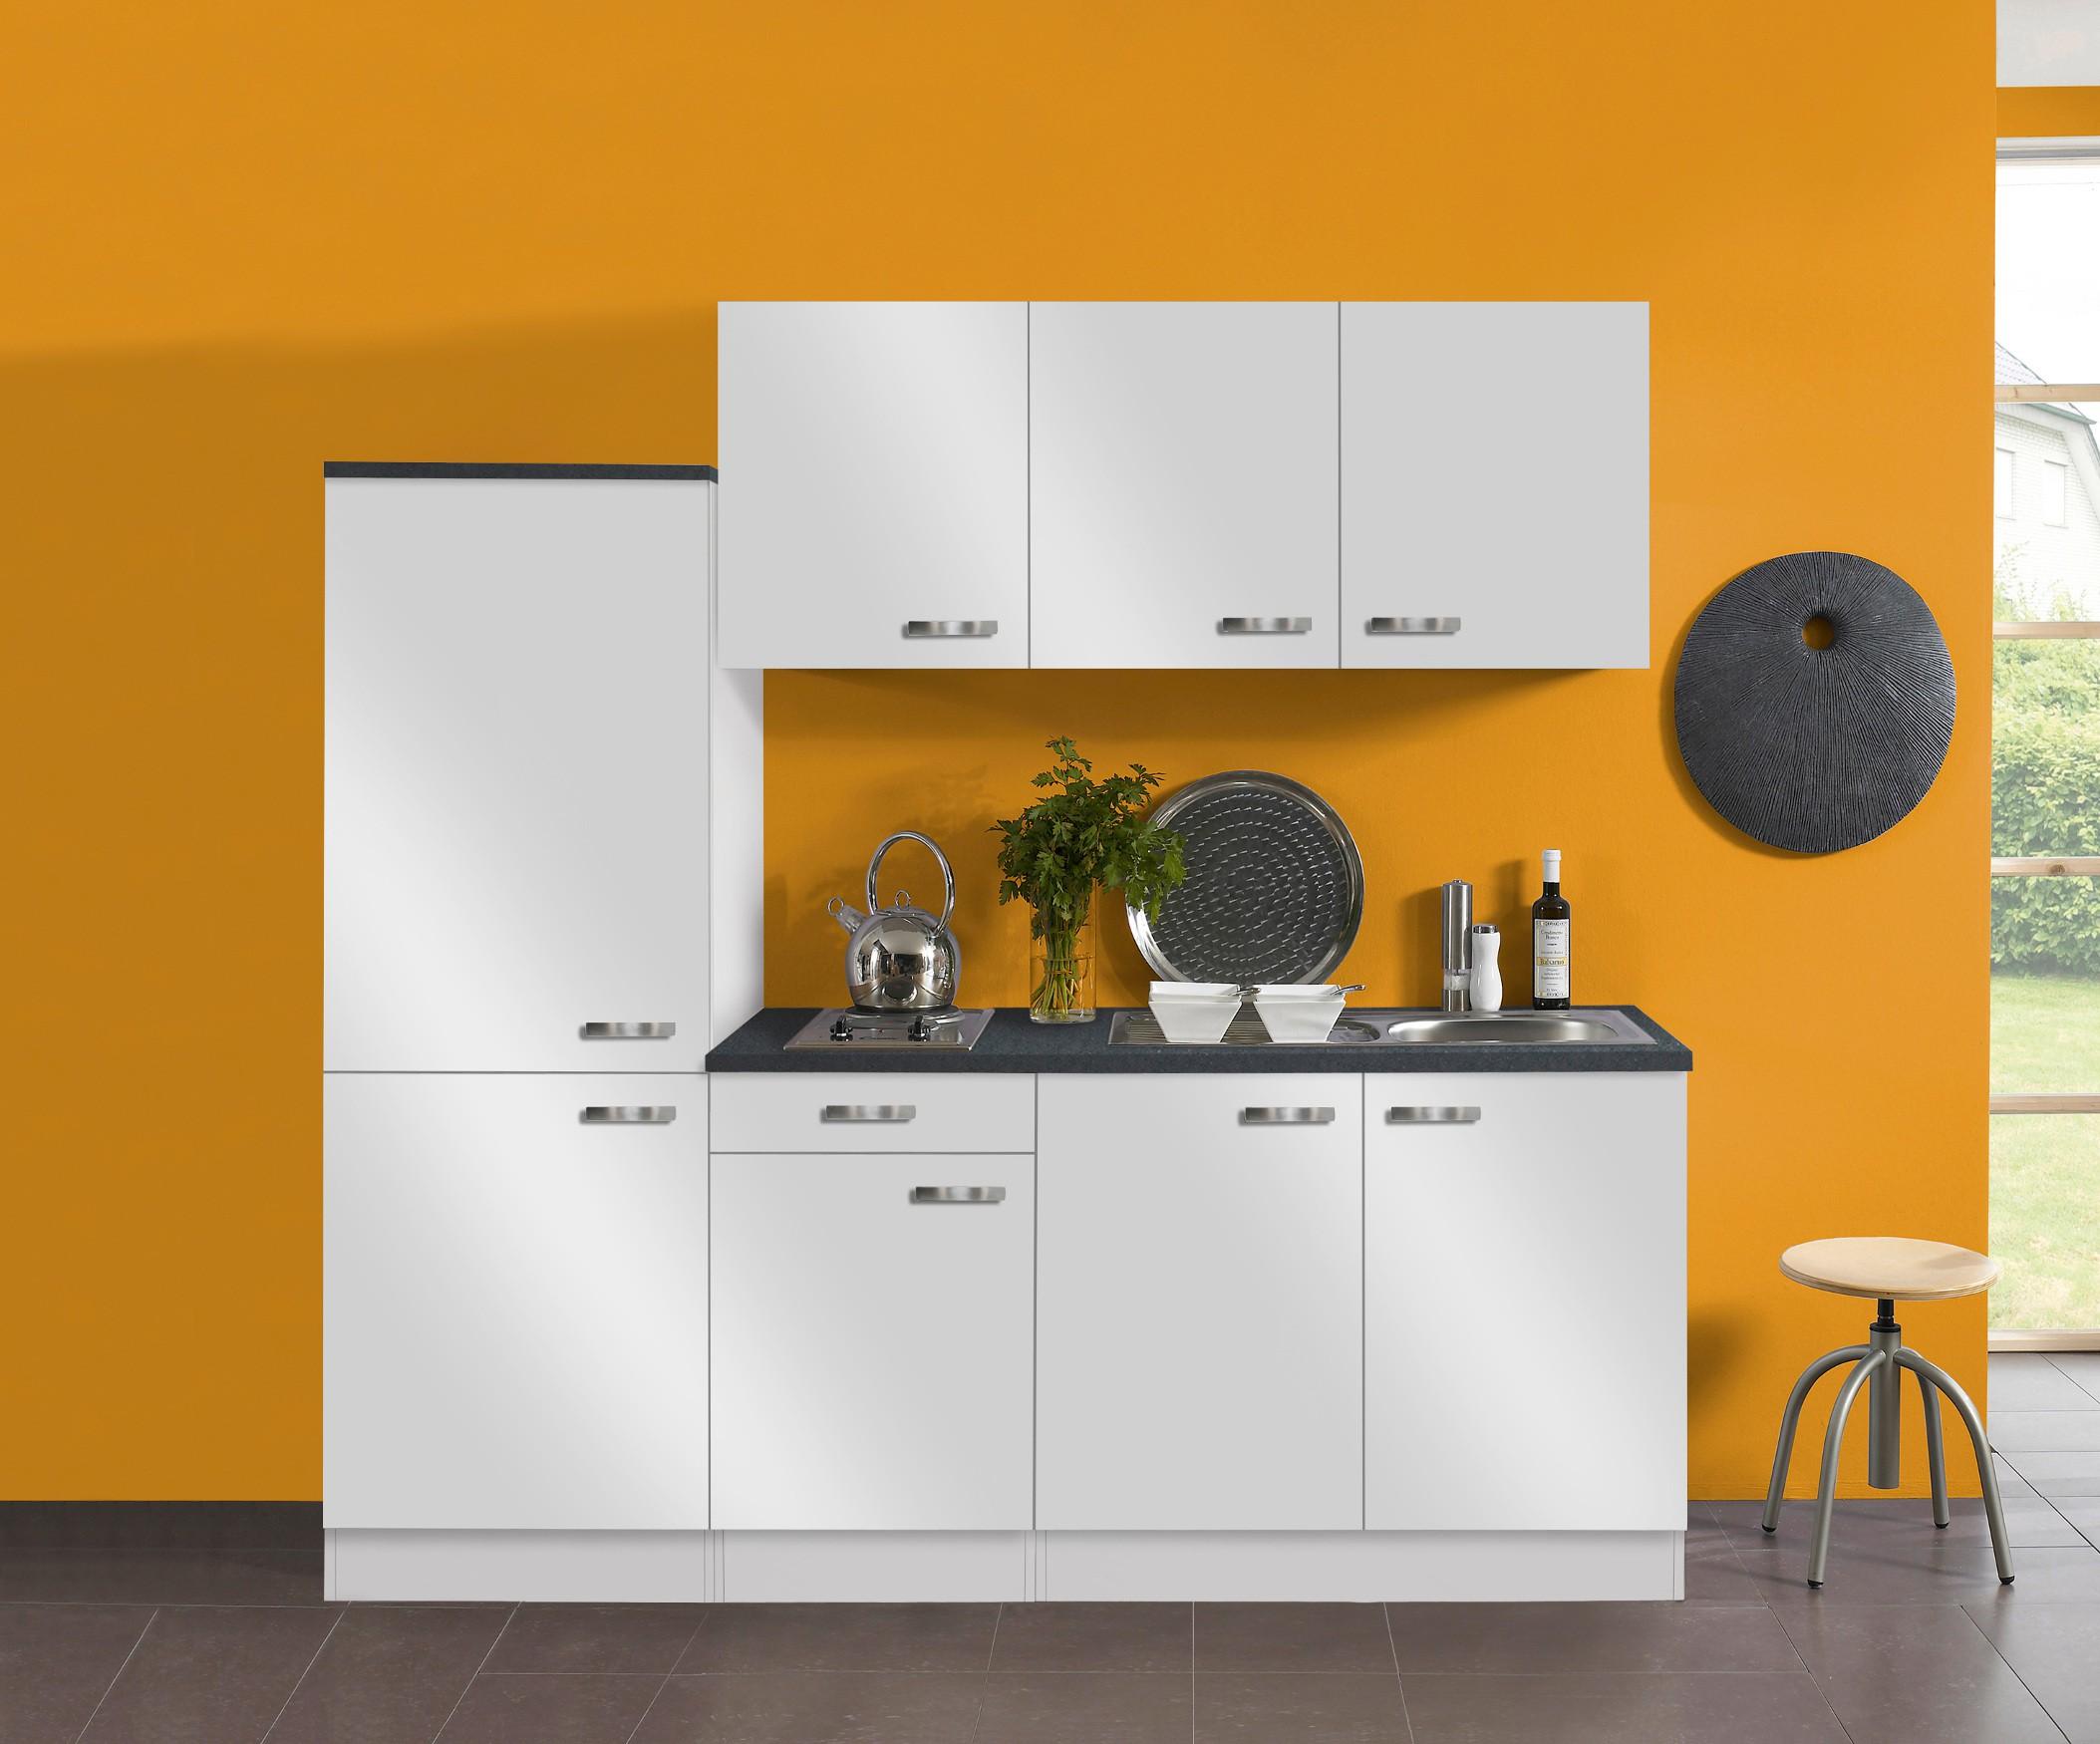 Miniküche Mit Kühlschrank Spüle Rechts : Singleküche granada vario 2 elektro 9 teilig breite 210 cm